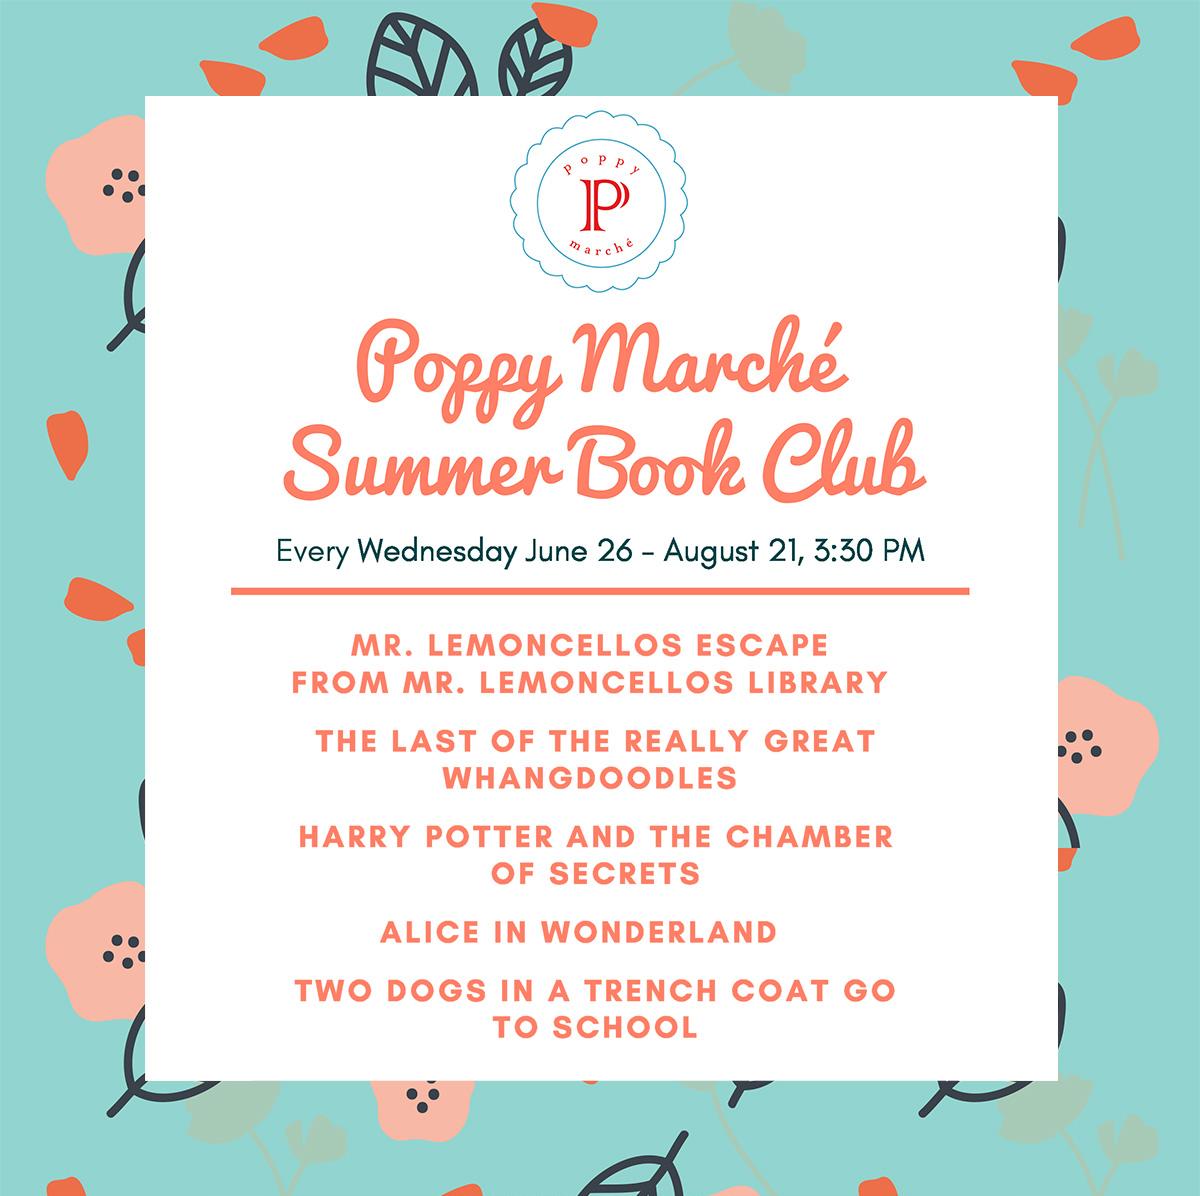 Poppy-Marché-Summer-Book-Club-square (1).jpg